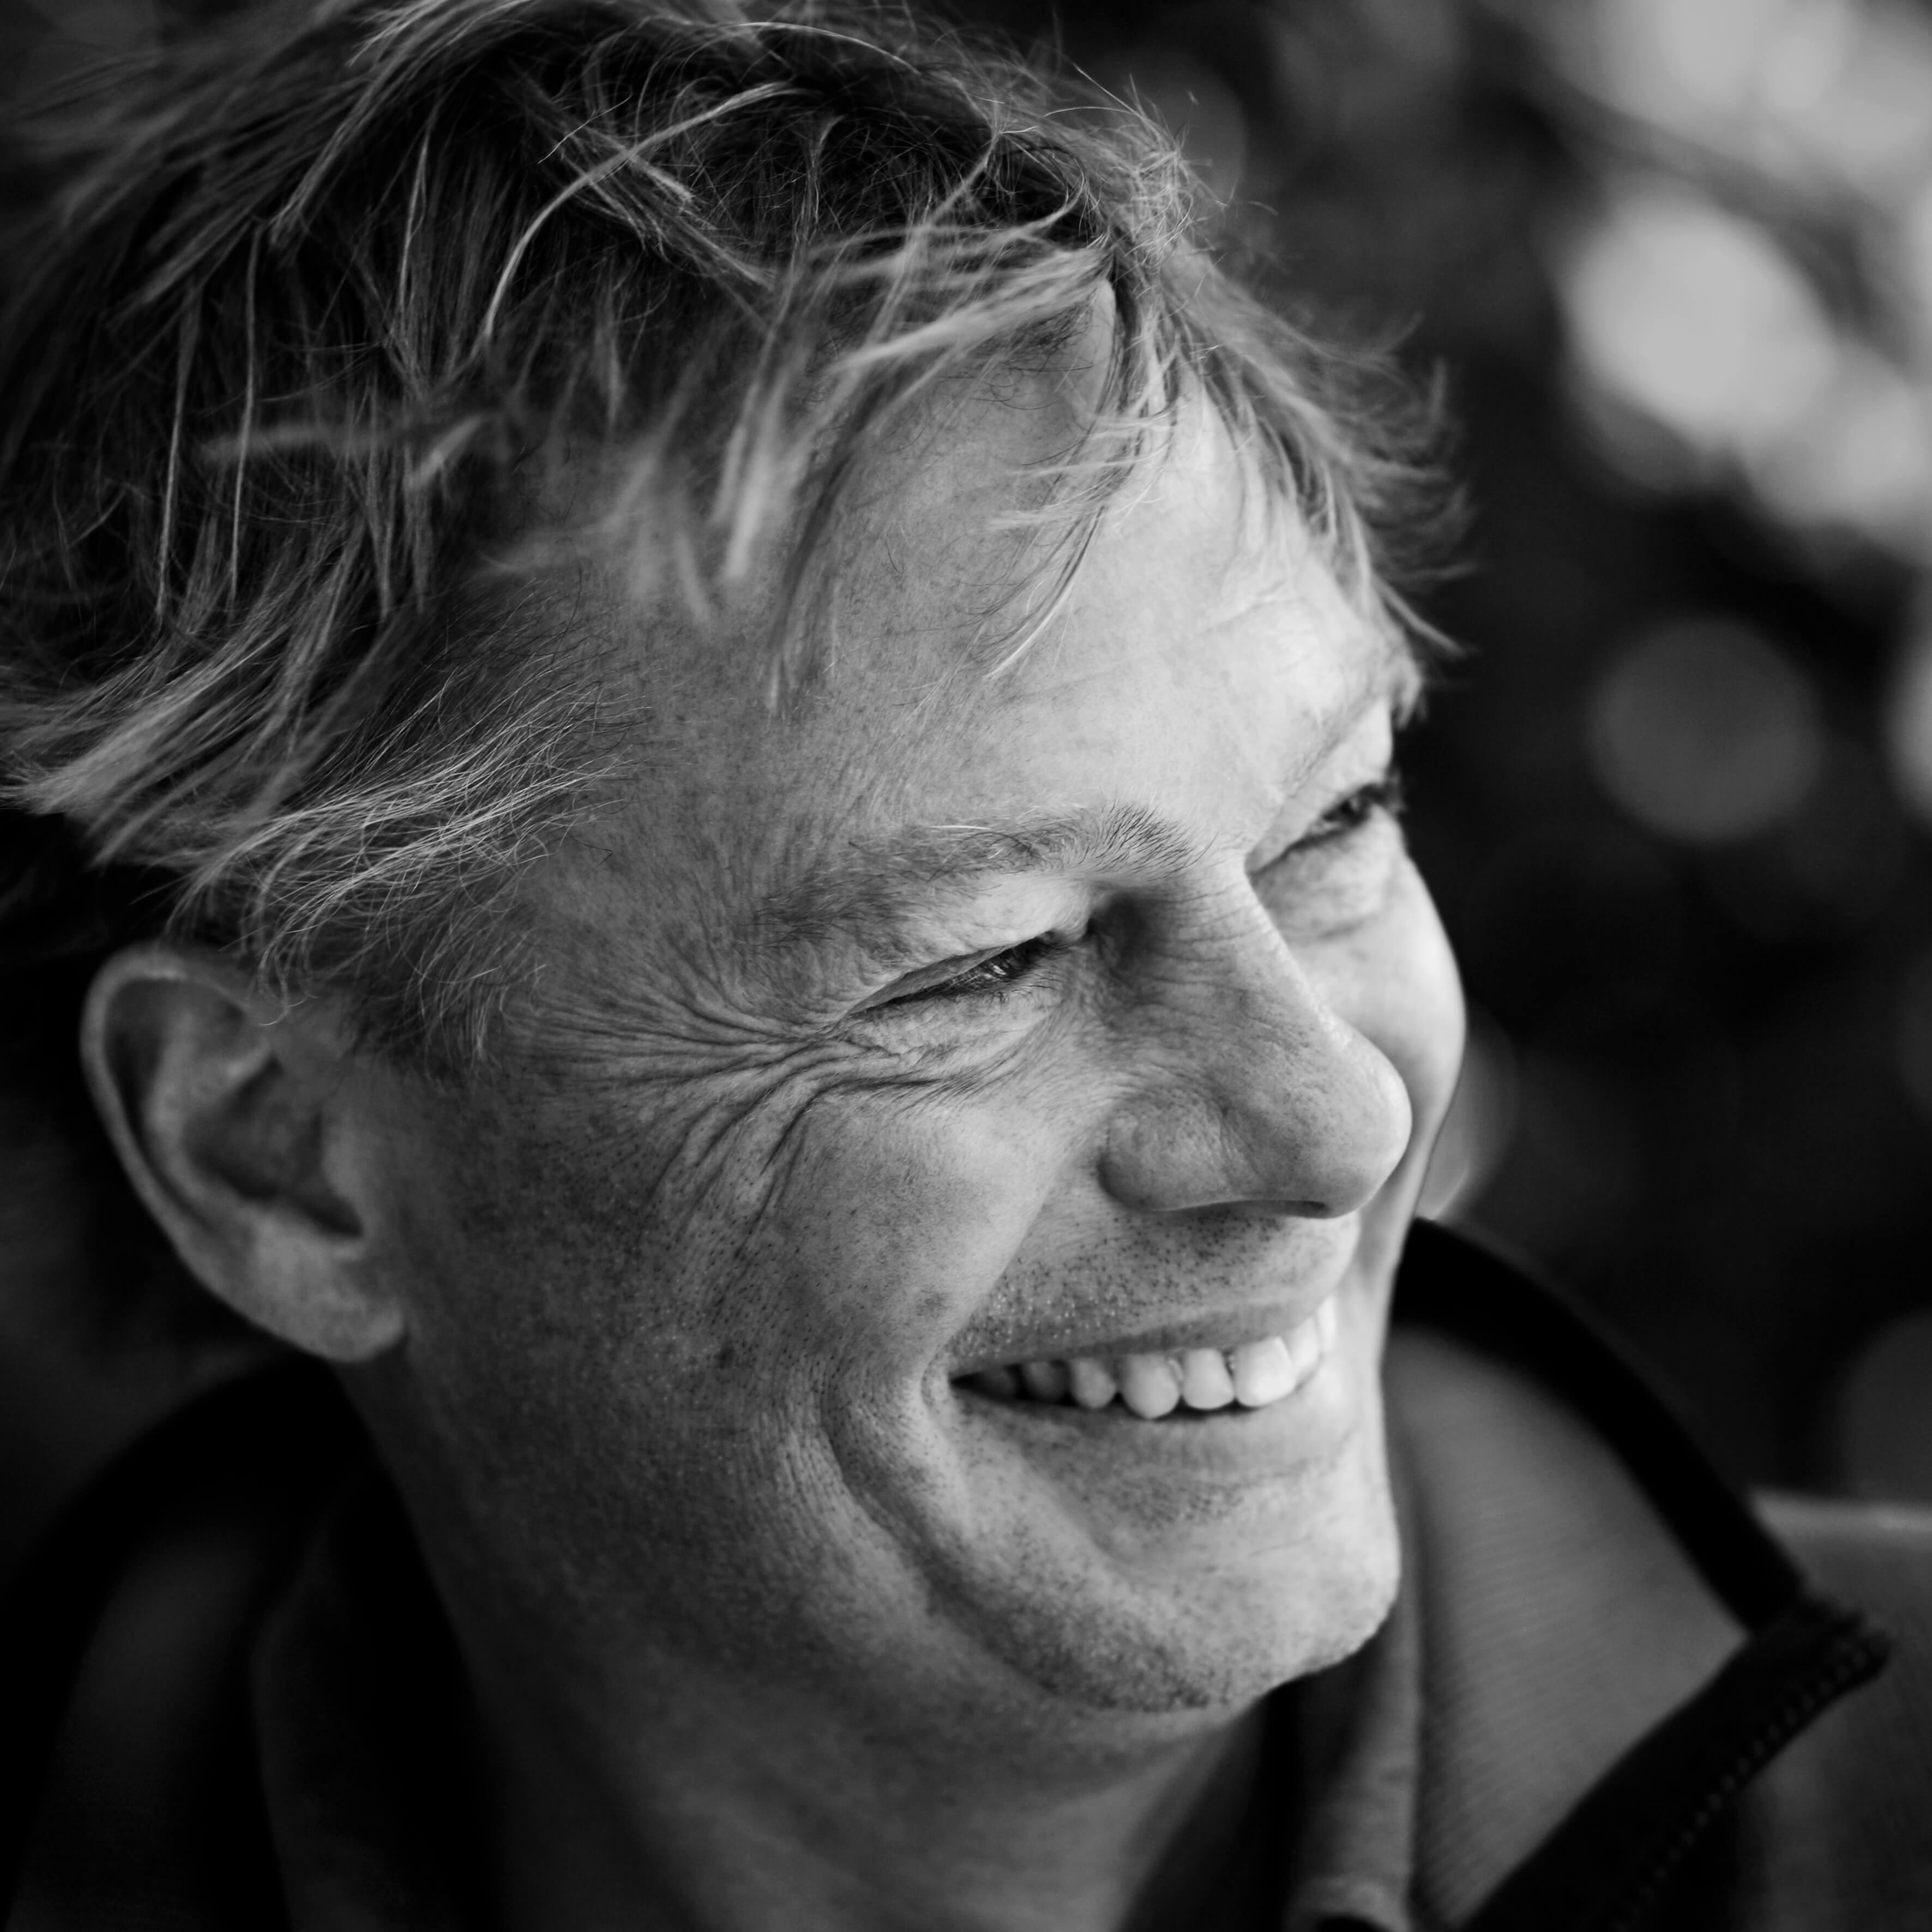 Frank Meijer landschapsarchitect architect portret karakter zwart wit mtd landschapsarchitecten Jurjen Poeles fotografie